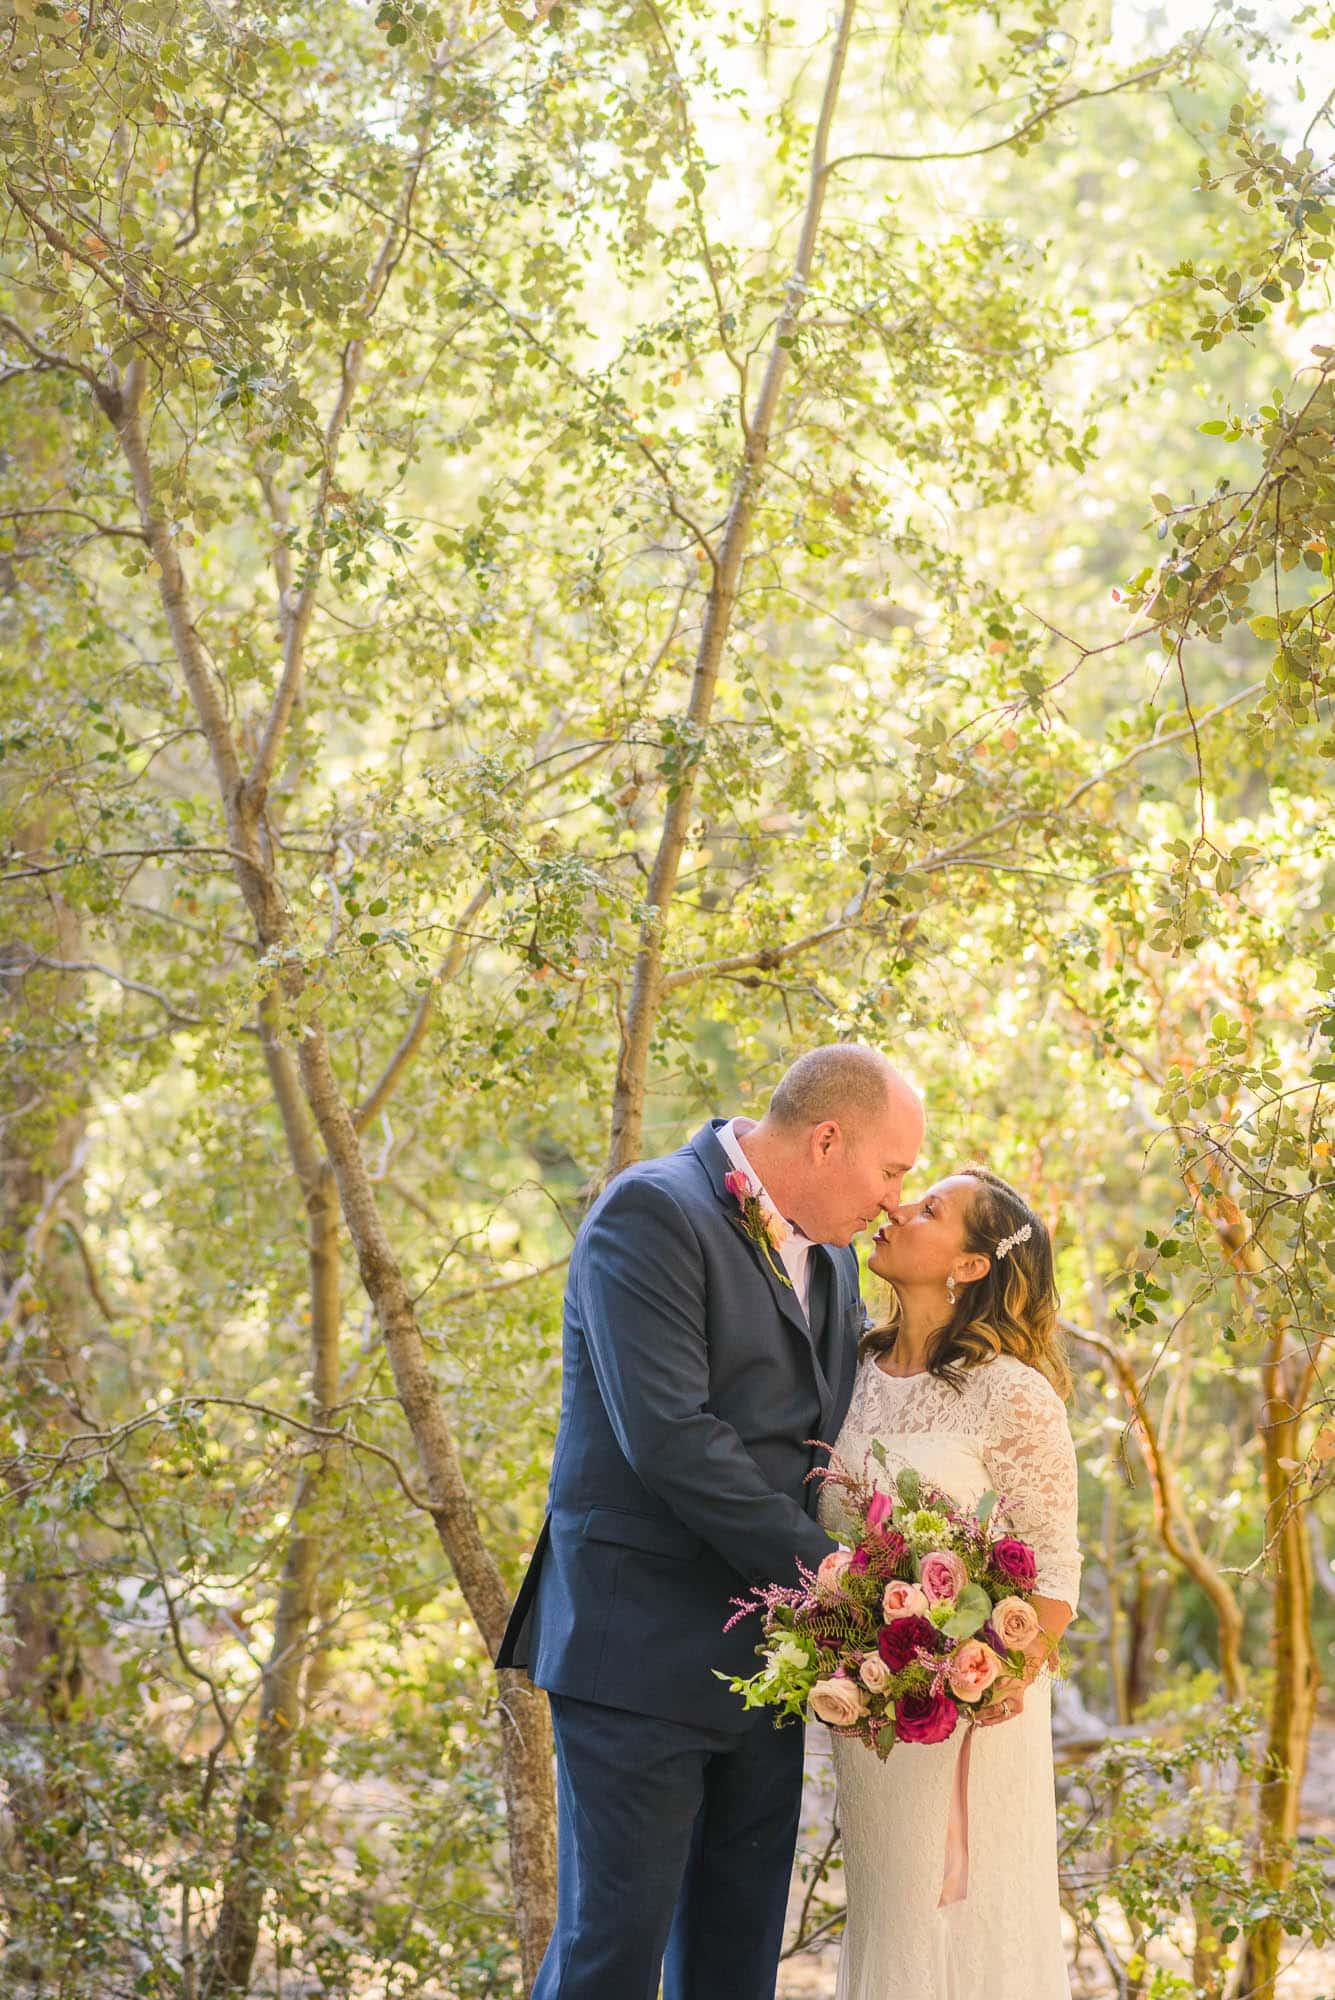 027_Alan_and_Heidi_Wedding_Jackie_Dannon